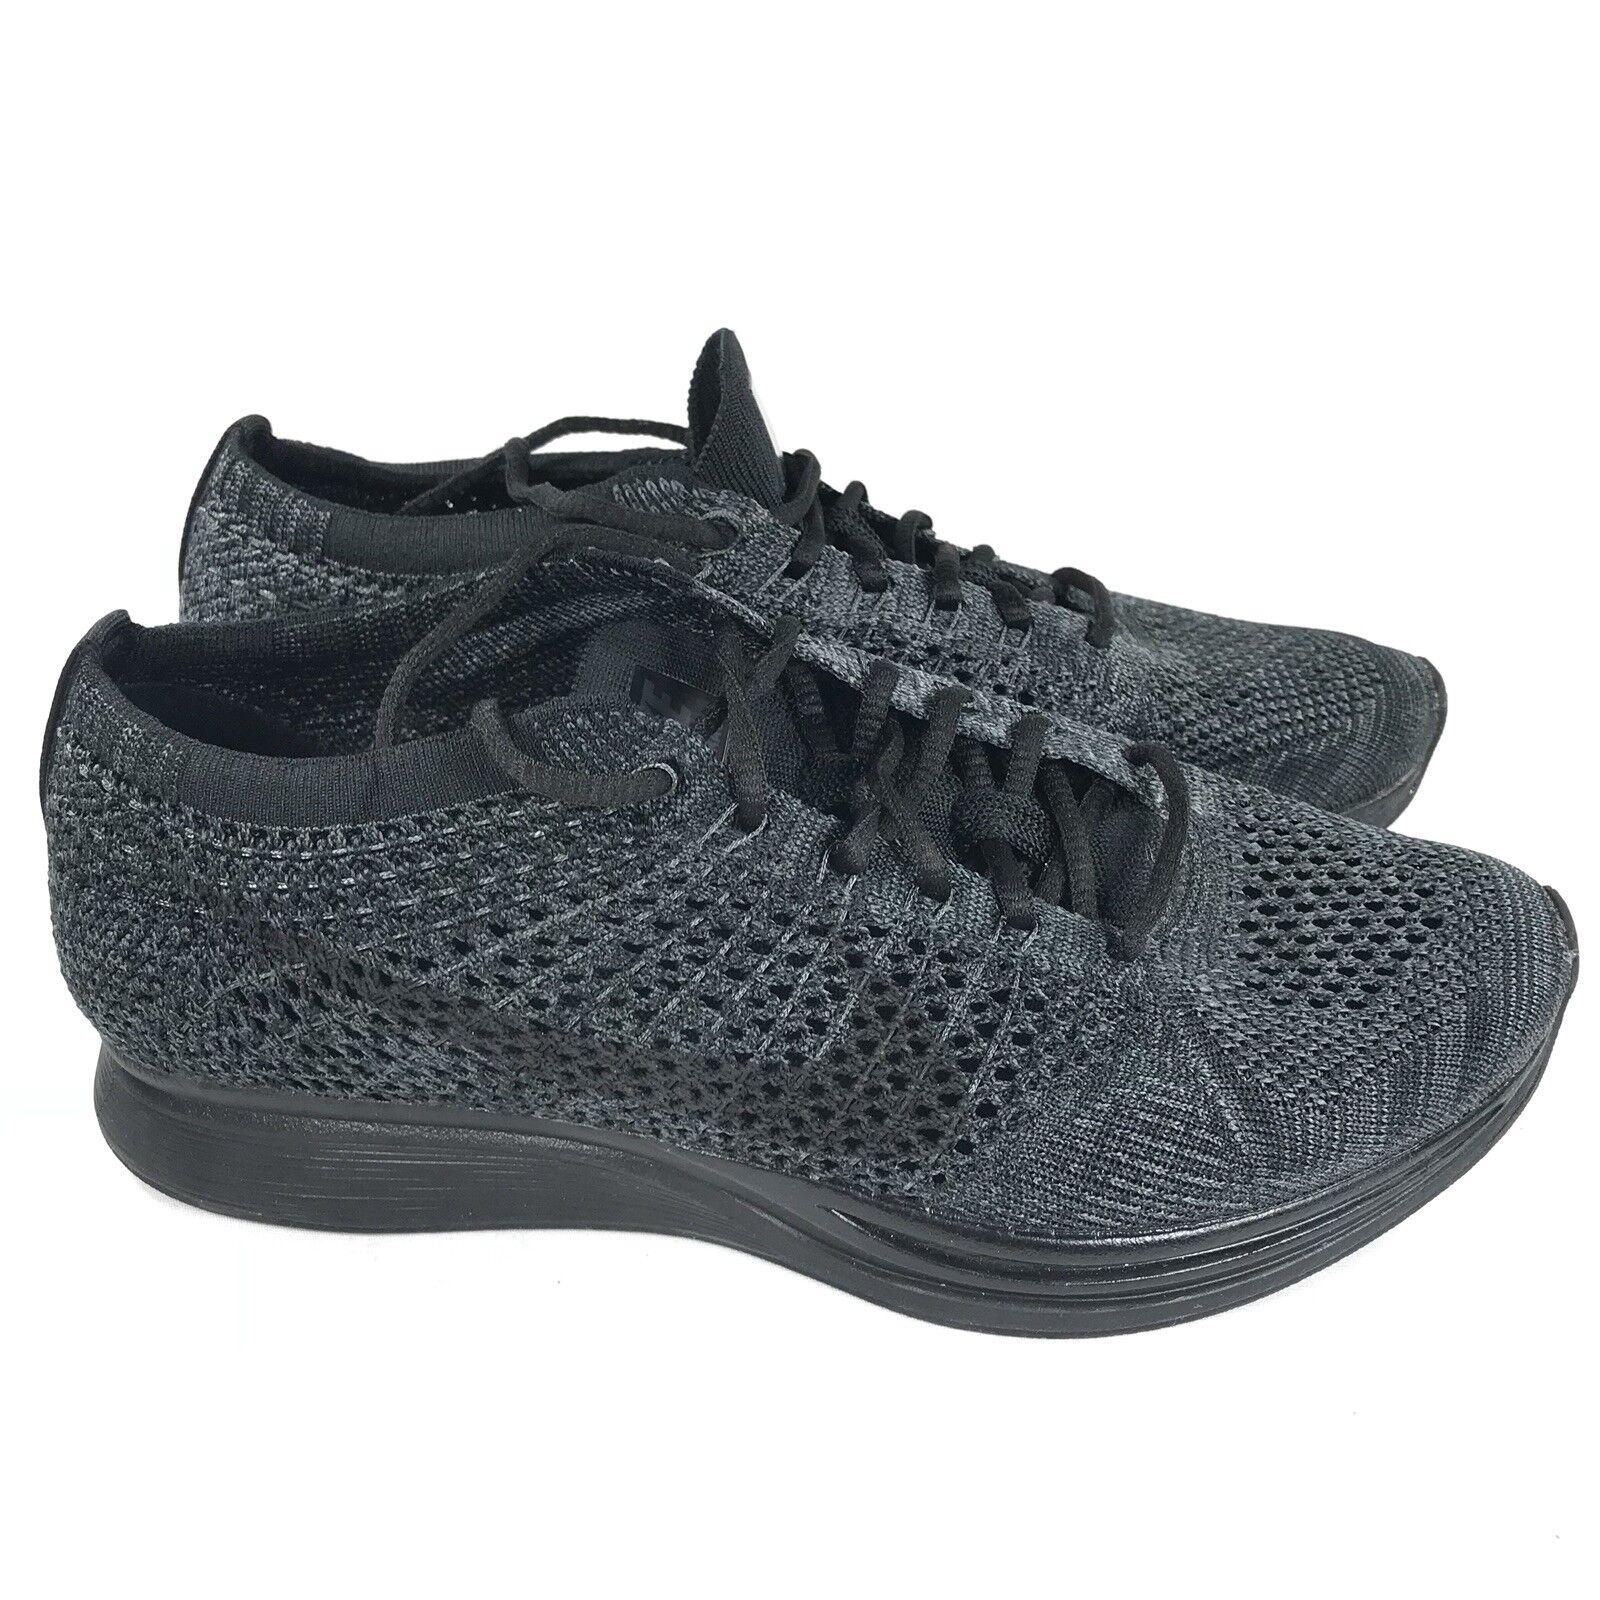 Nike Flyknit Racer Triple Black Anthracite 526628-009 Men's Size 6.5 Wmns 8